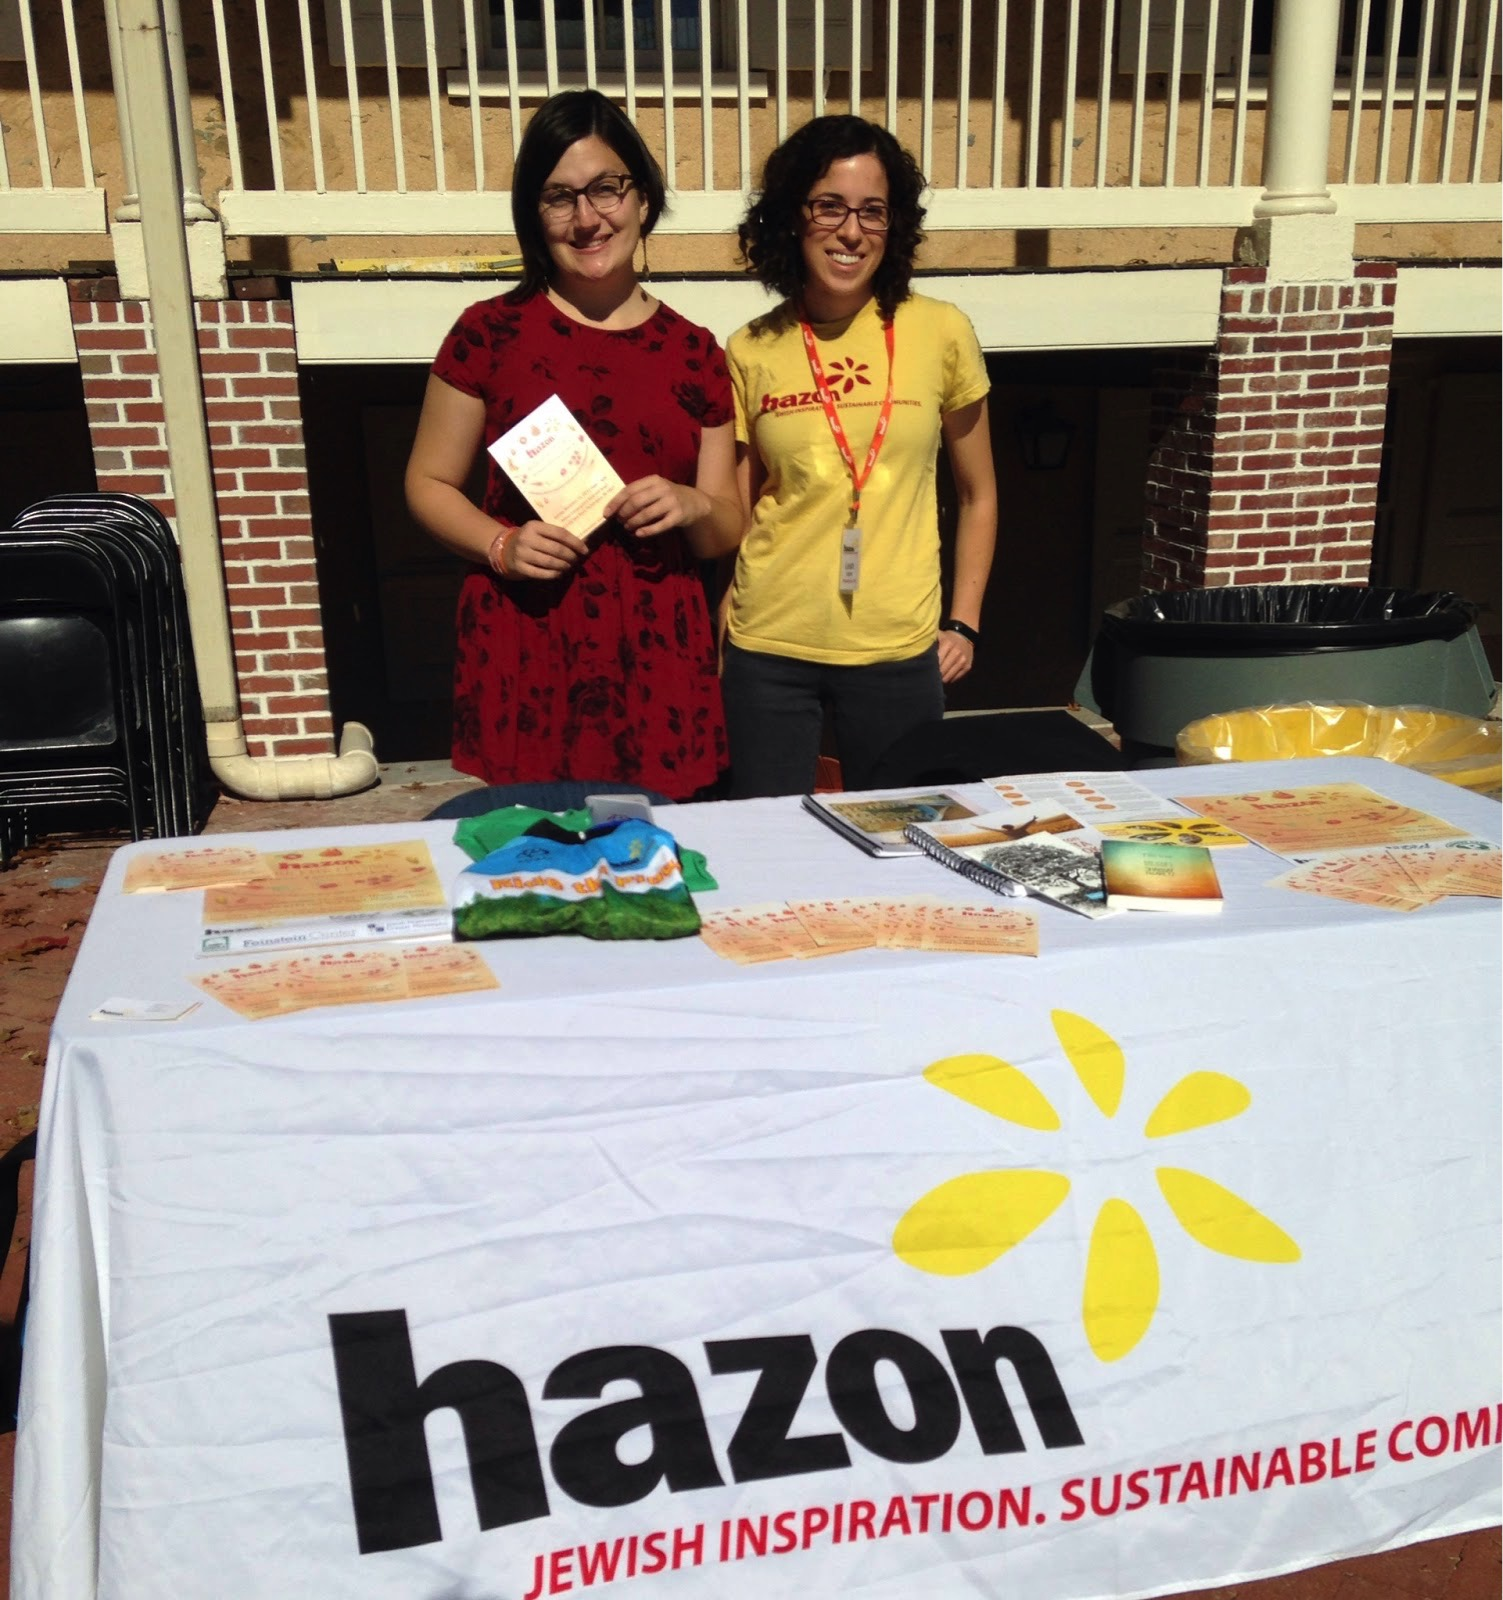 Representatives from Hazon.